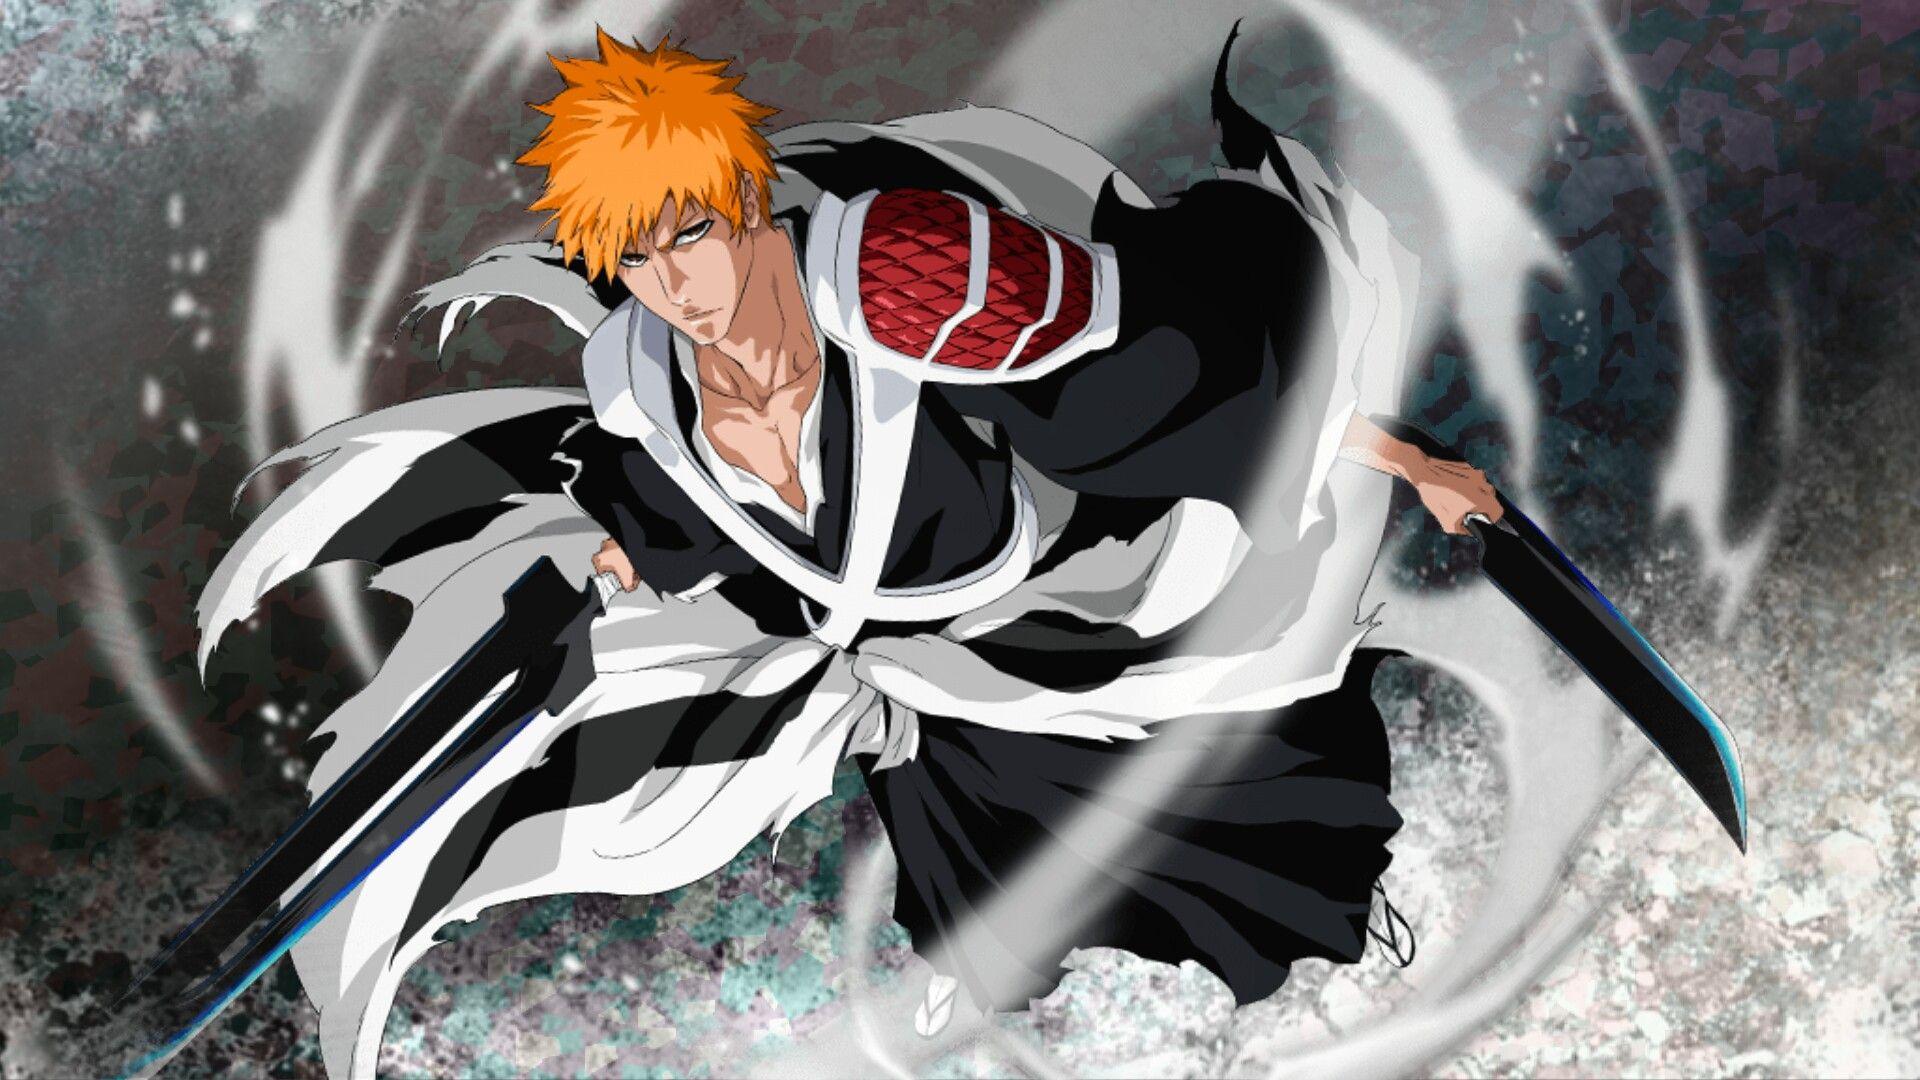 Ichigo, beautiful Bleach Brave Souls Kurosaki ichigo